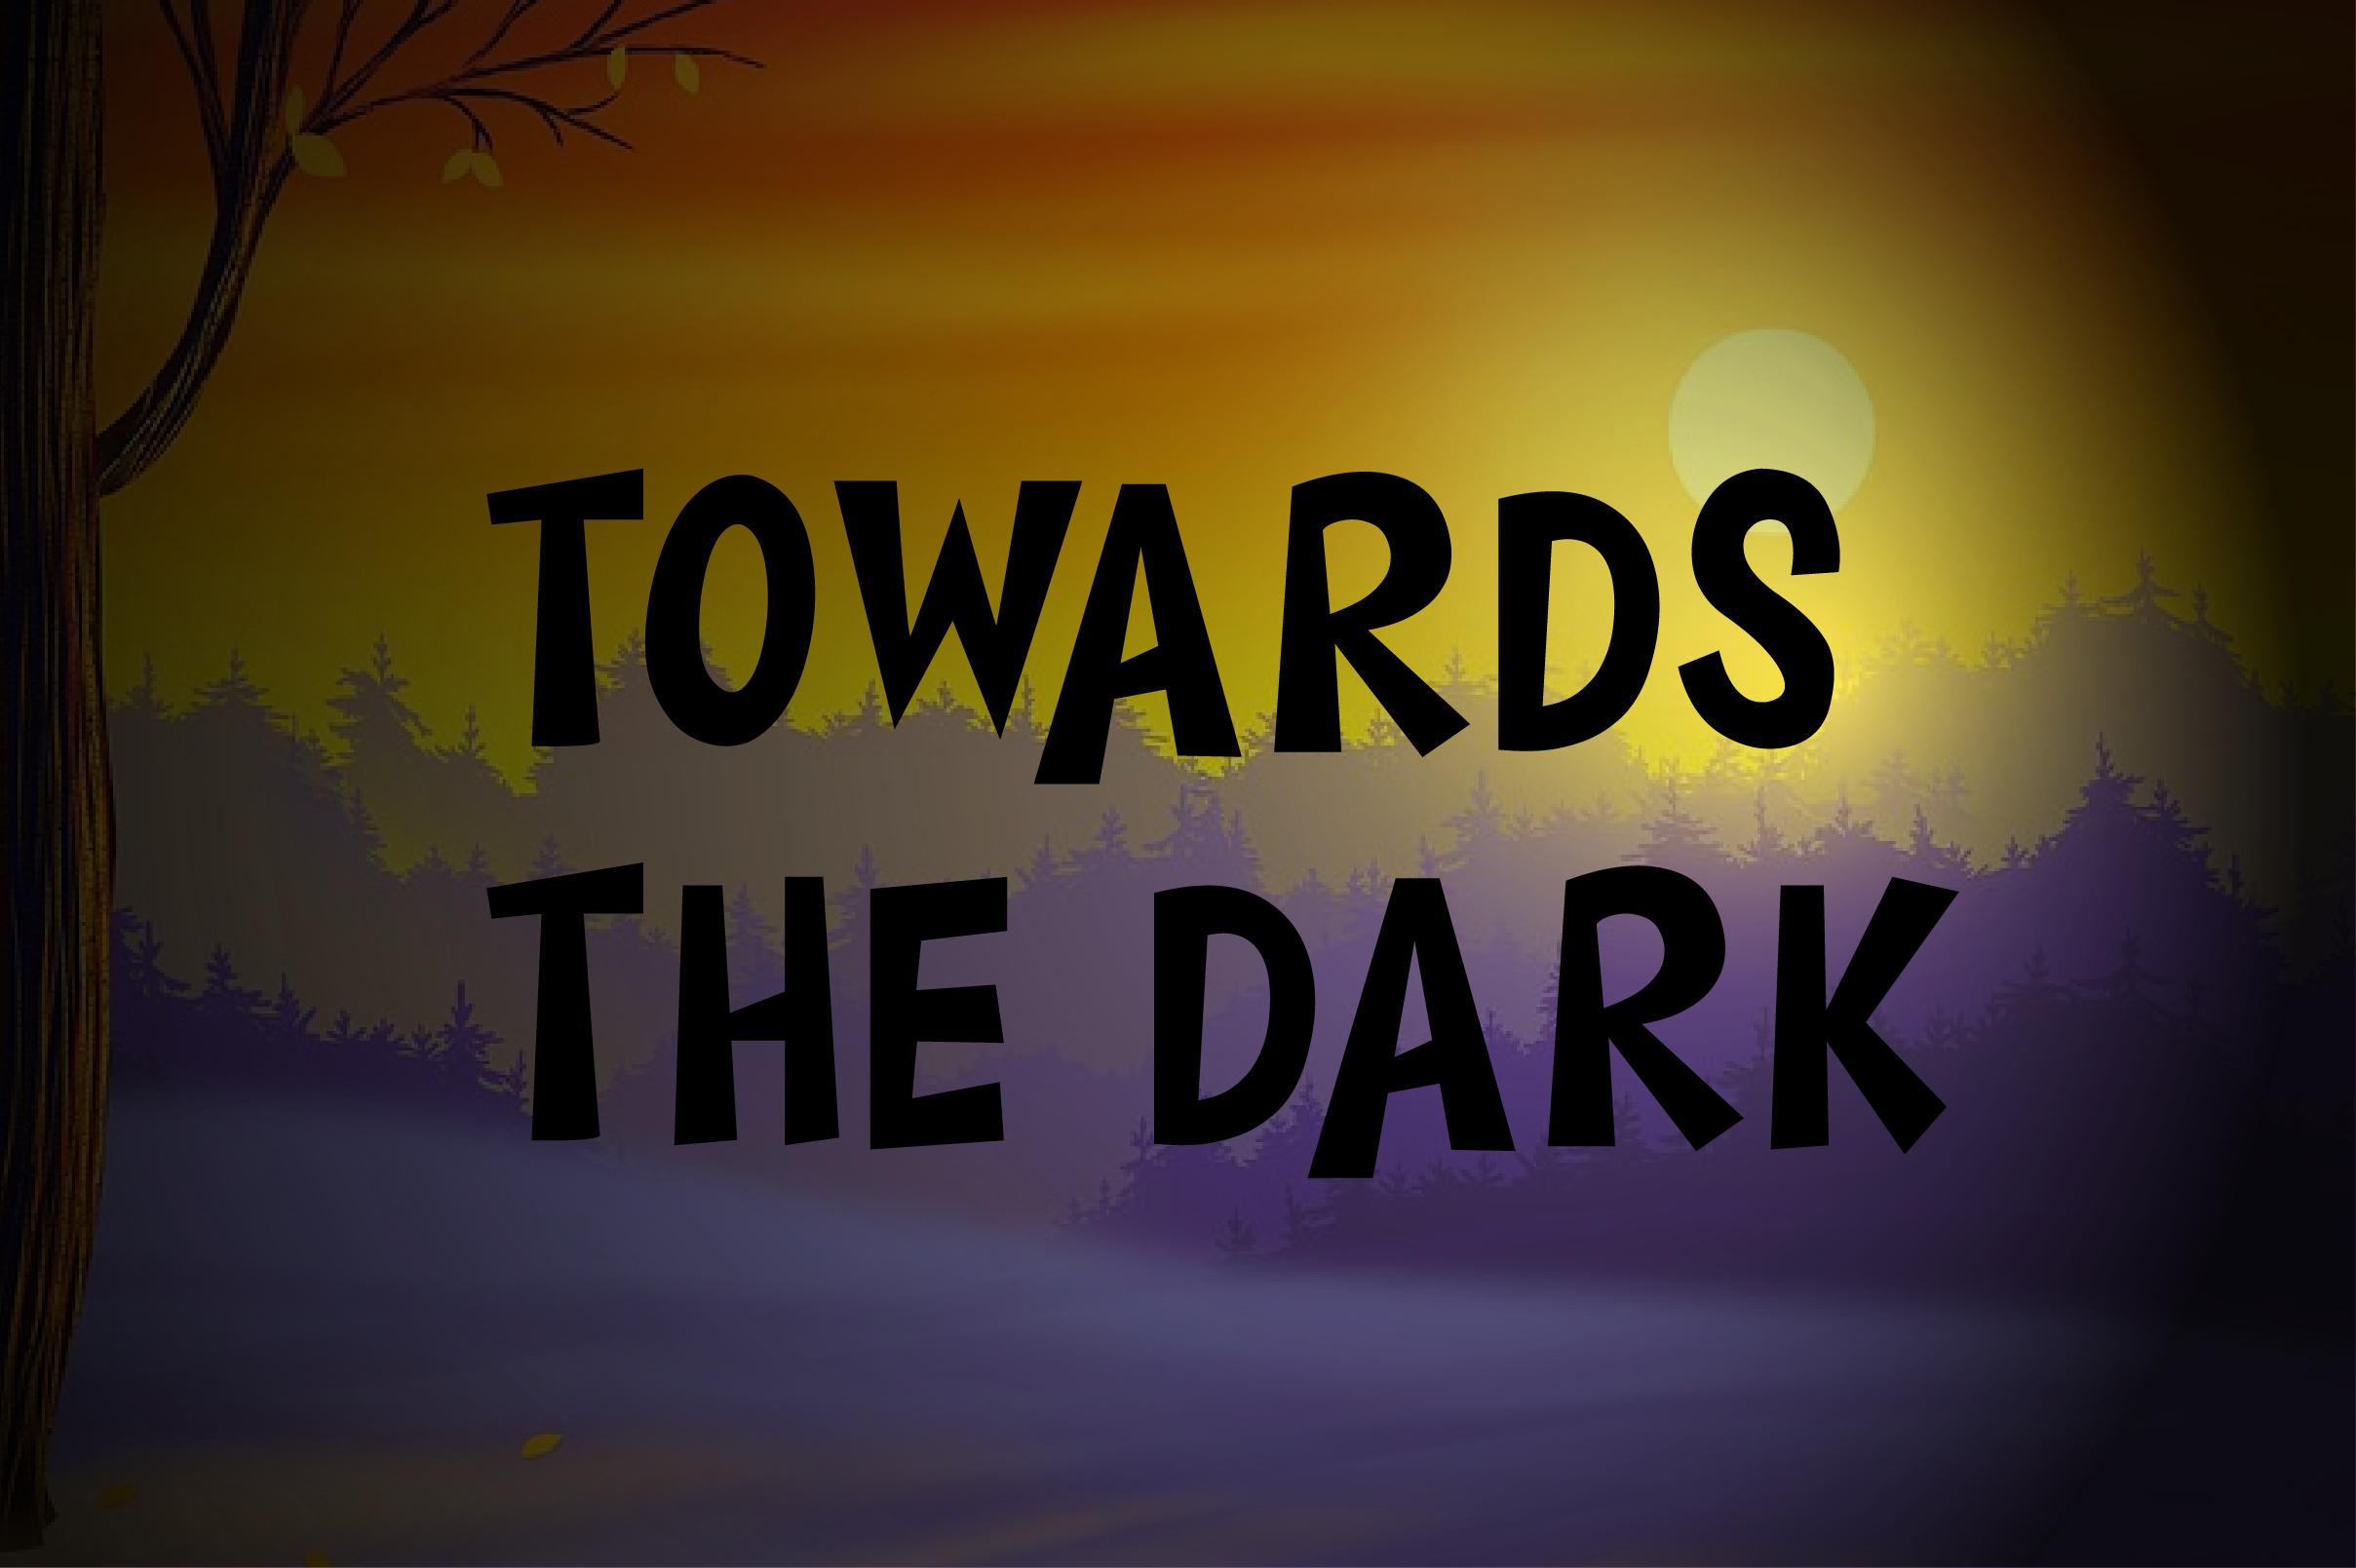 Towards The Dark example image 1